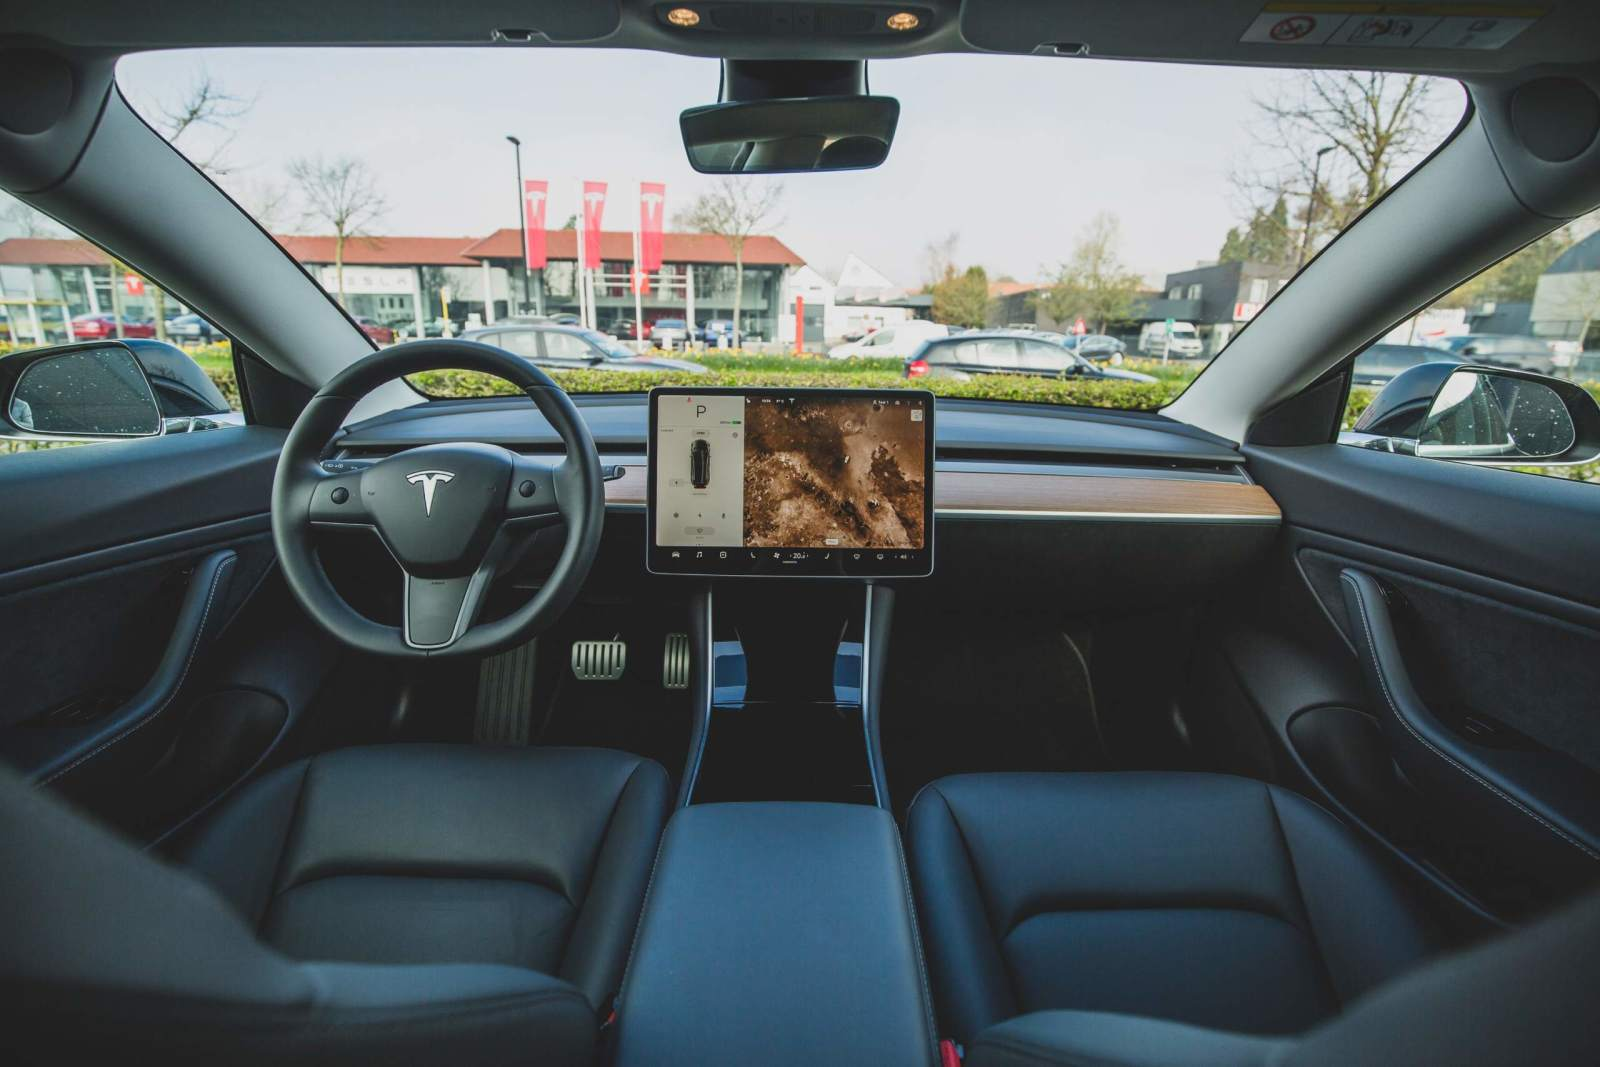 Tesla E-Auto Beispielfoto